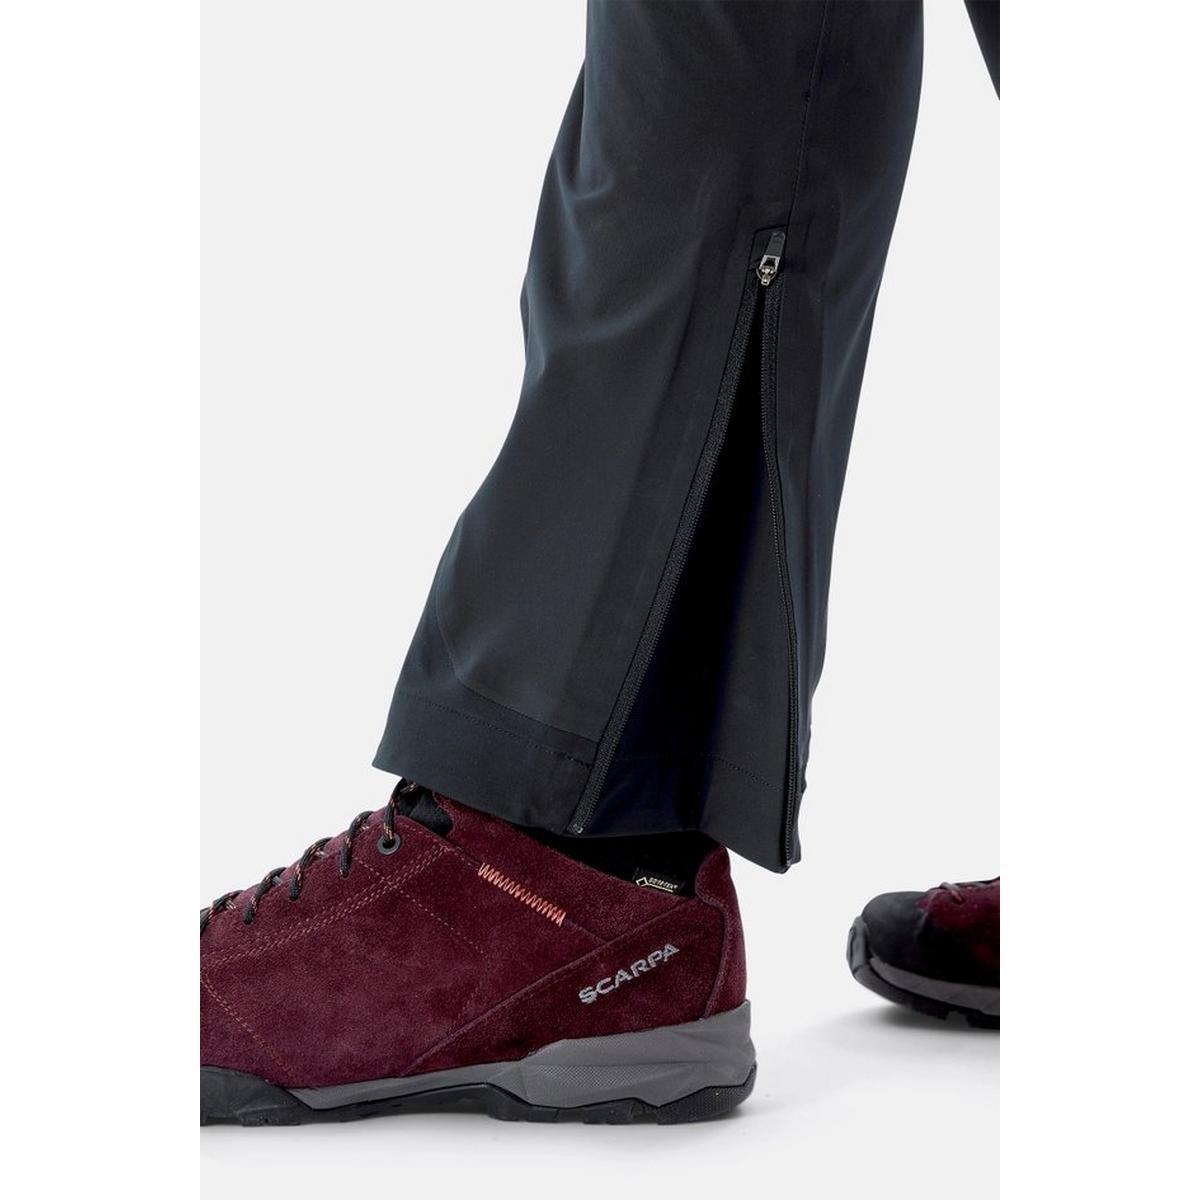 Rab Women's Kinetic 2.0 Pant ? Grey